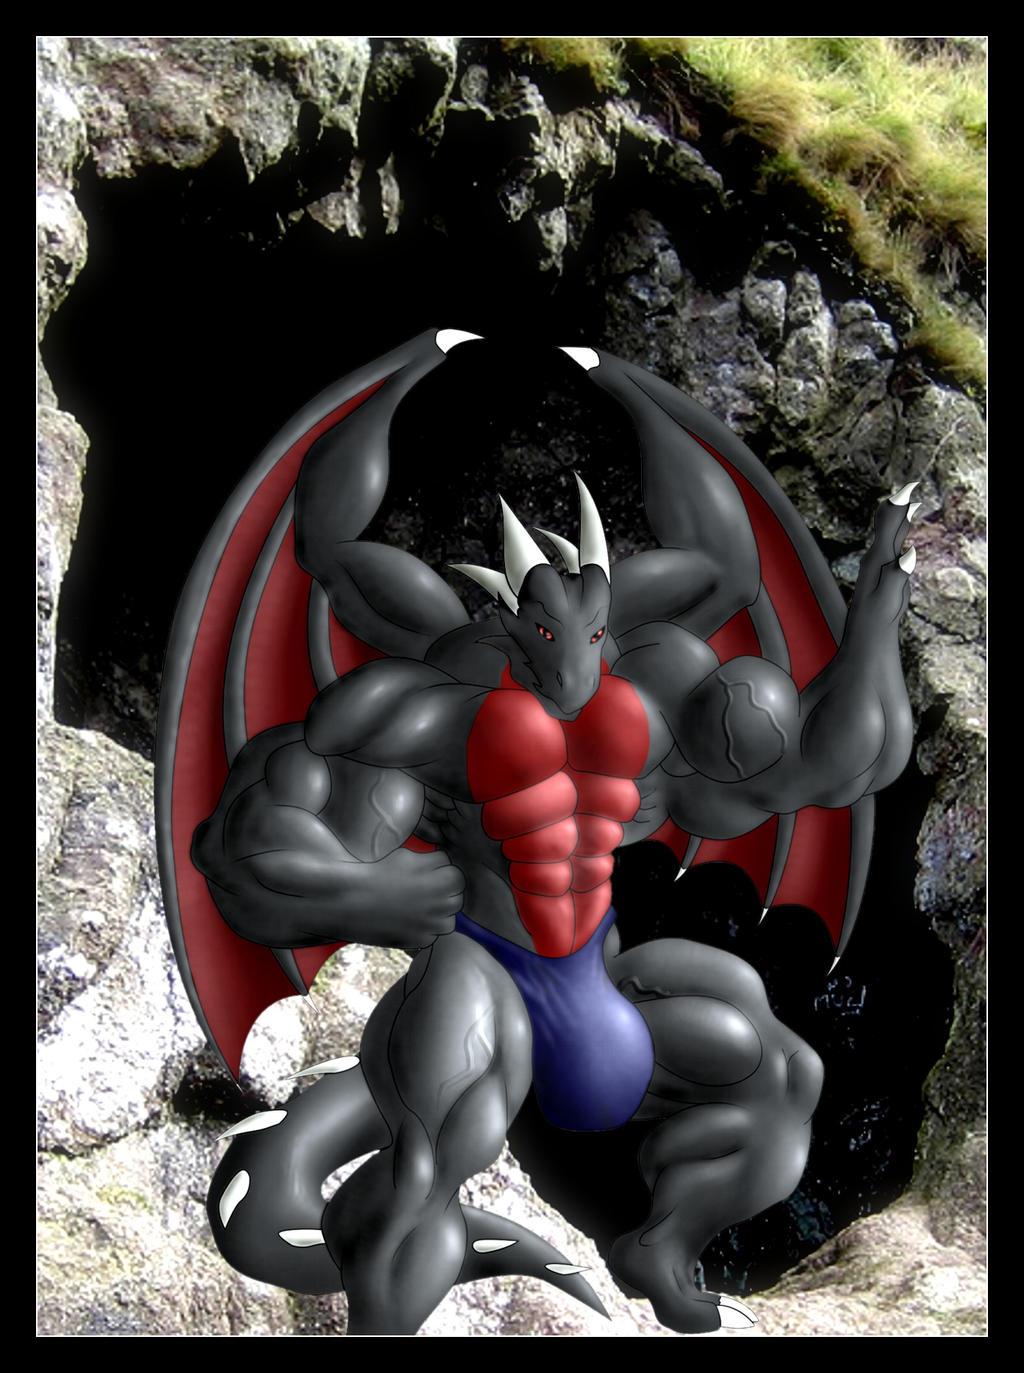 Big dragon by Berni8